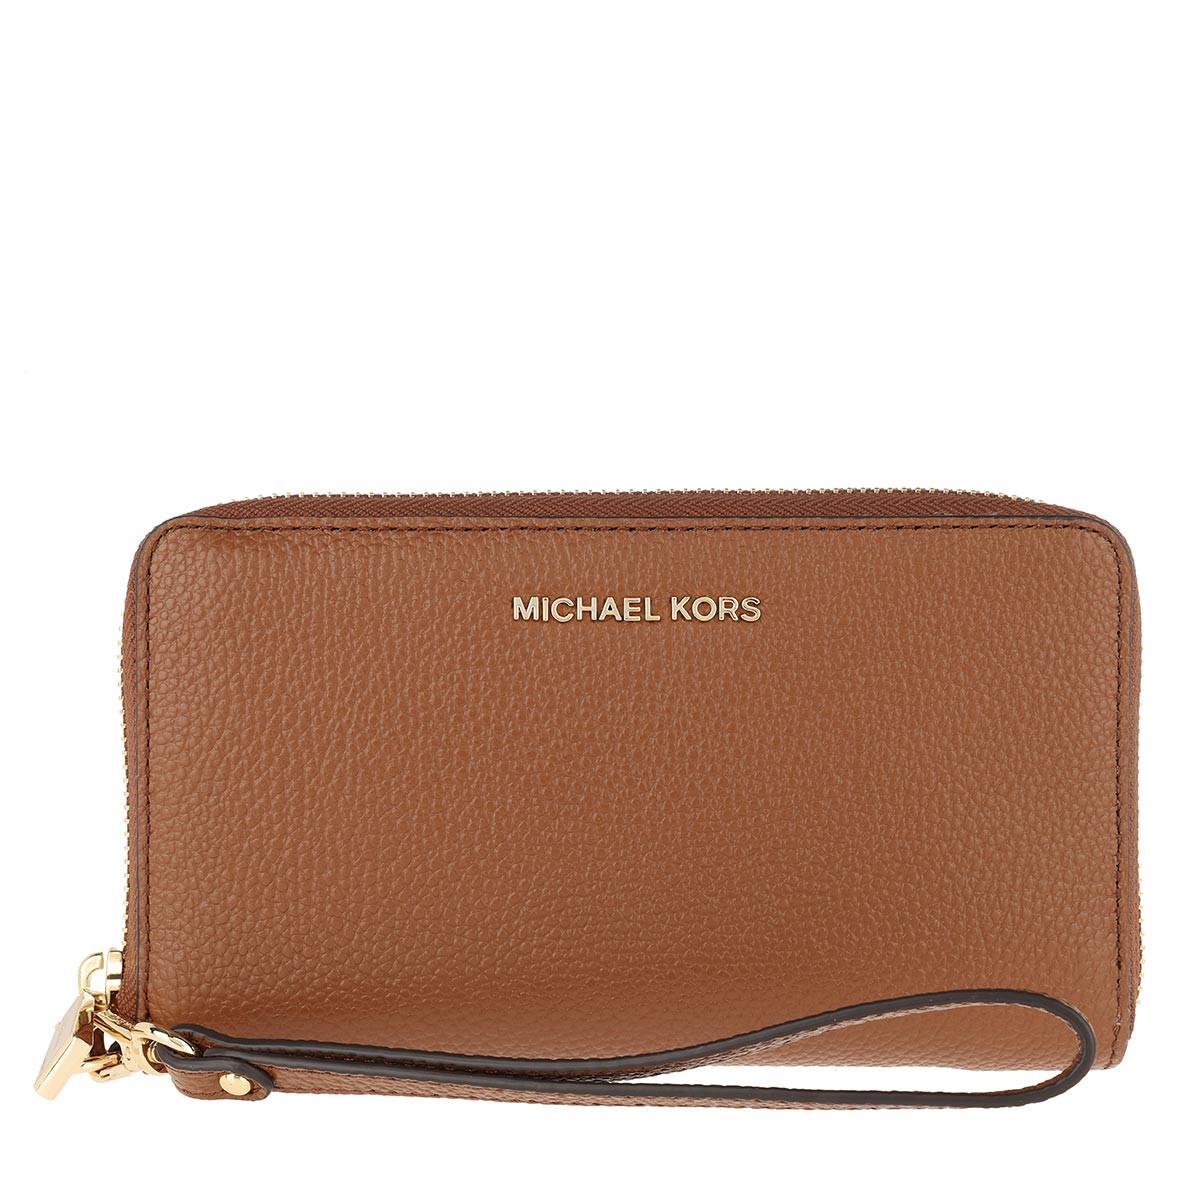 Michael Kors Portemonnaie - Jet Set Large Flat Multifunction Phone Case Luggage - in cognac - für Damen